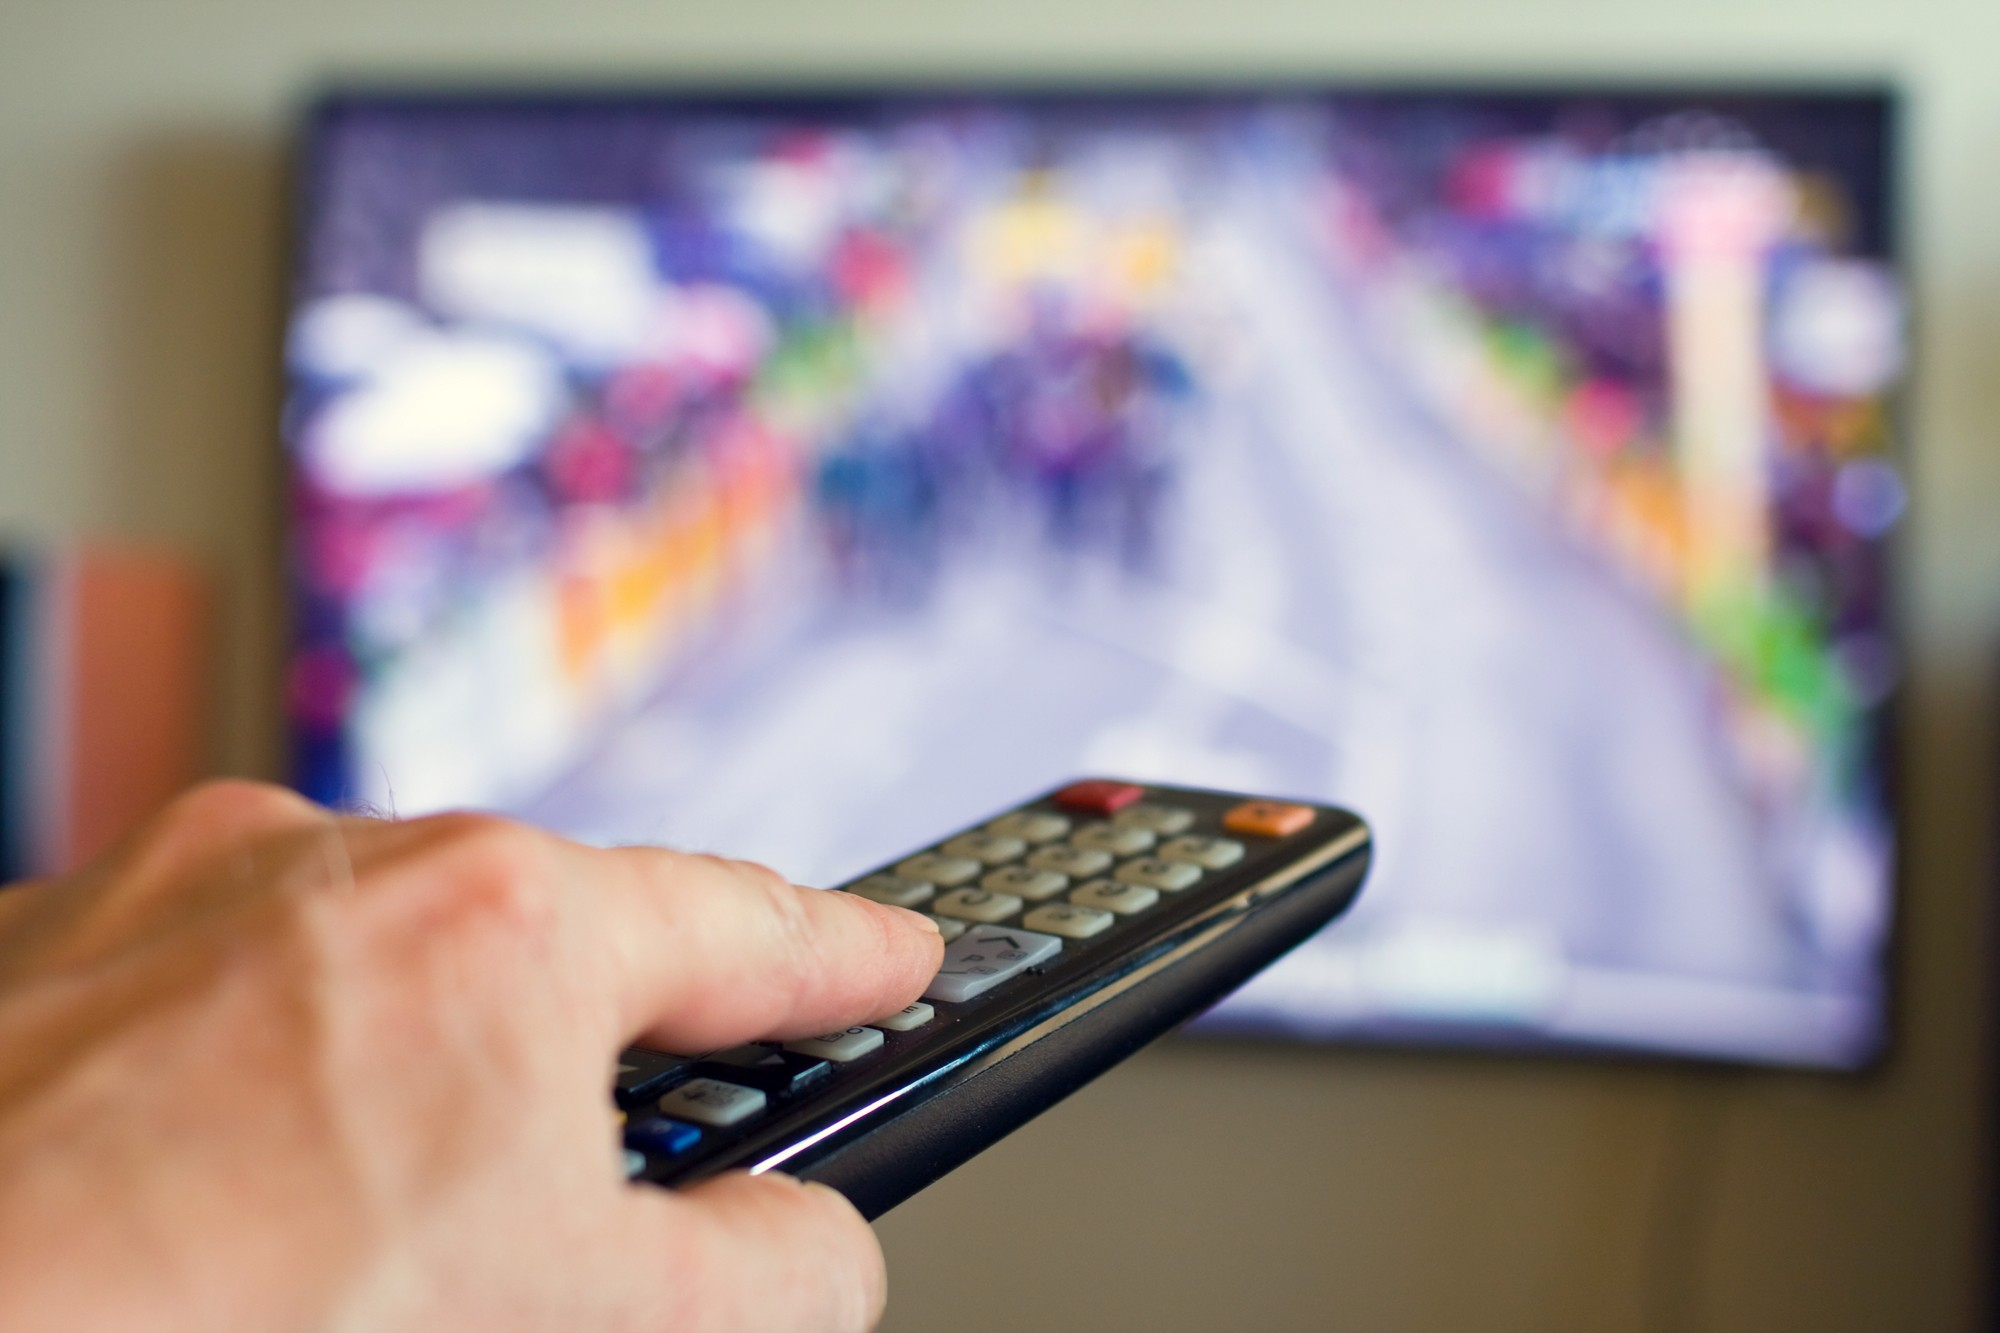 EDO: Measuring Consumer Engagement in TV Advertising